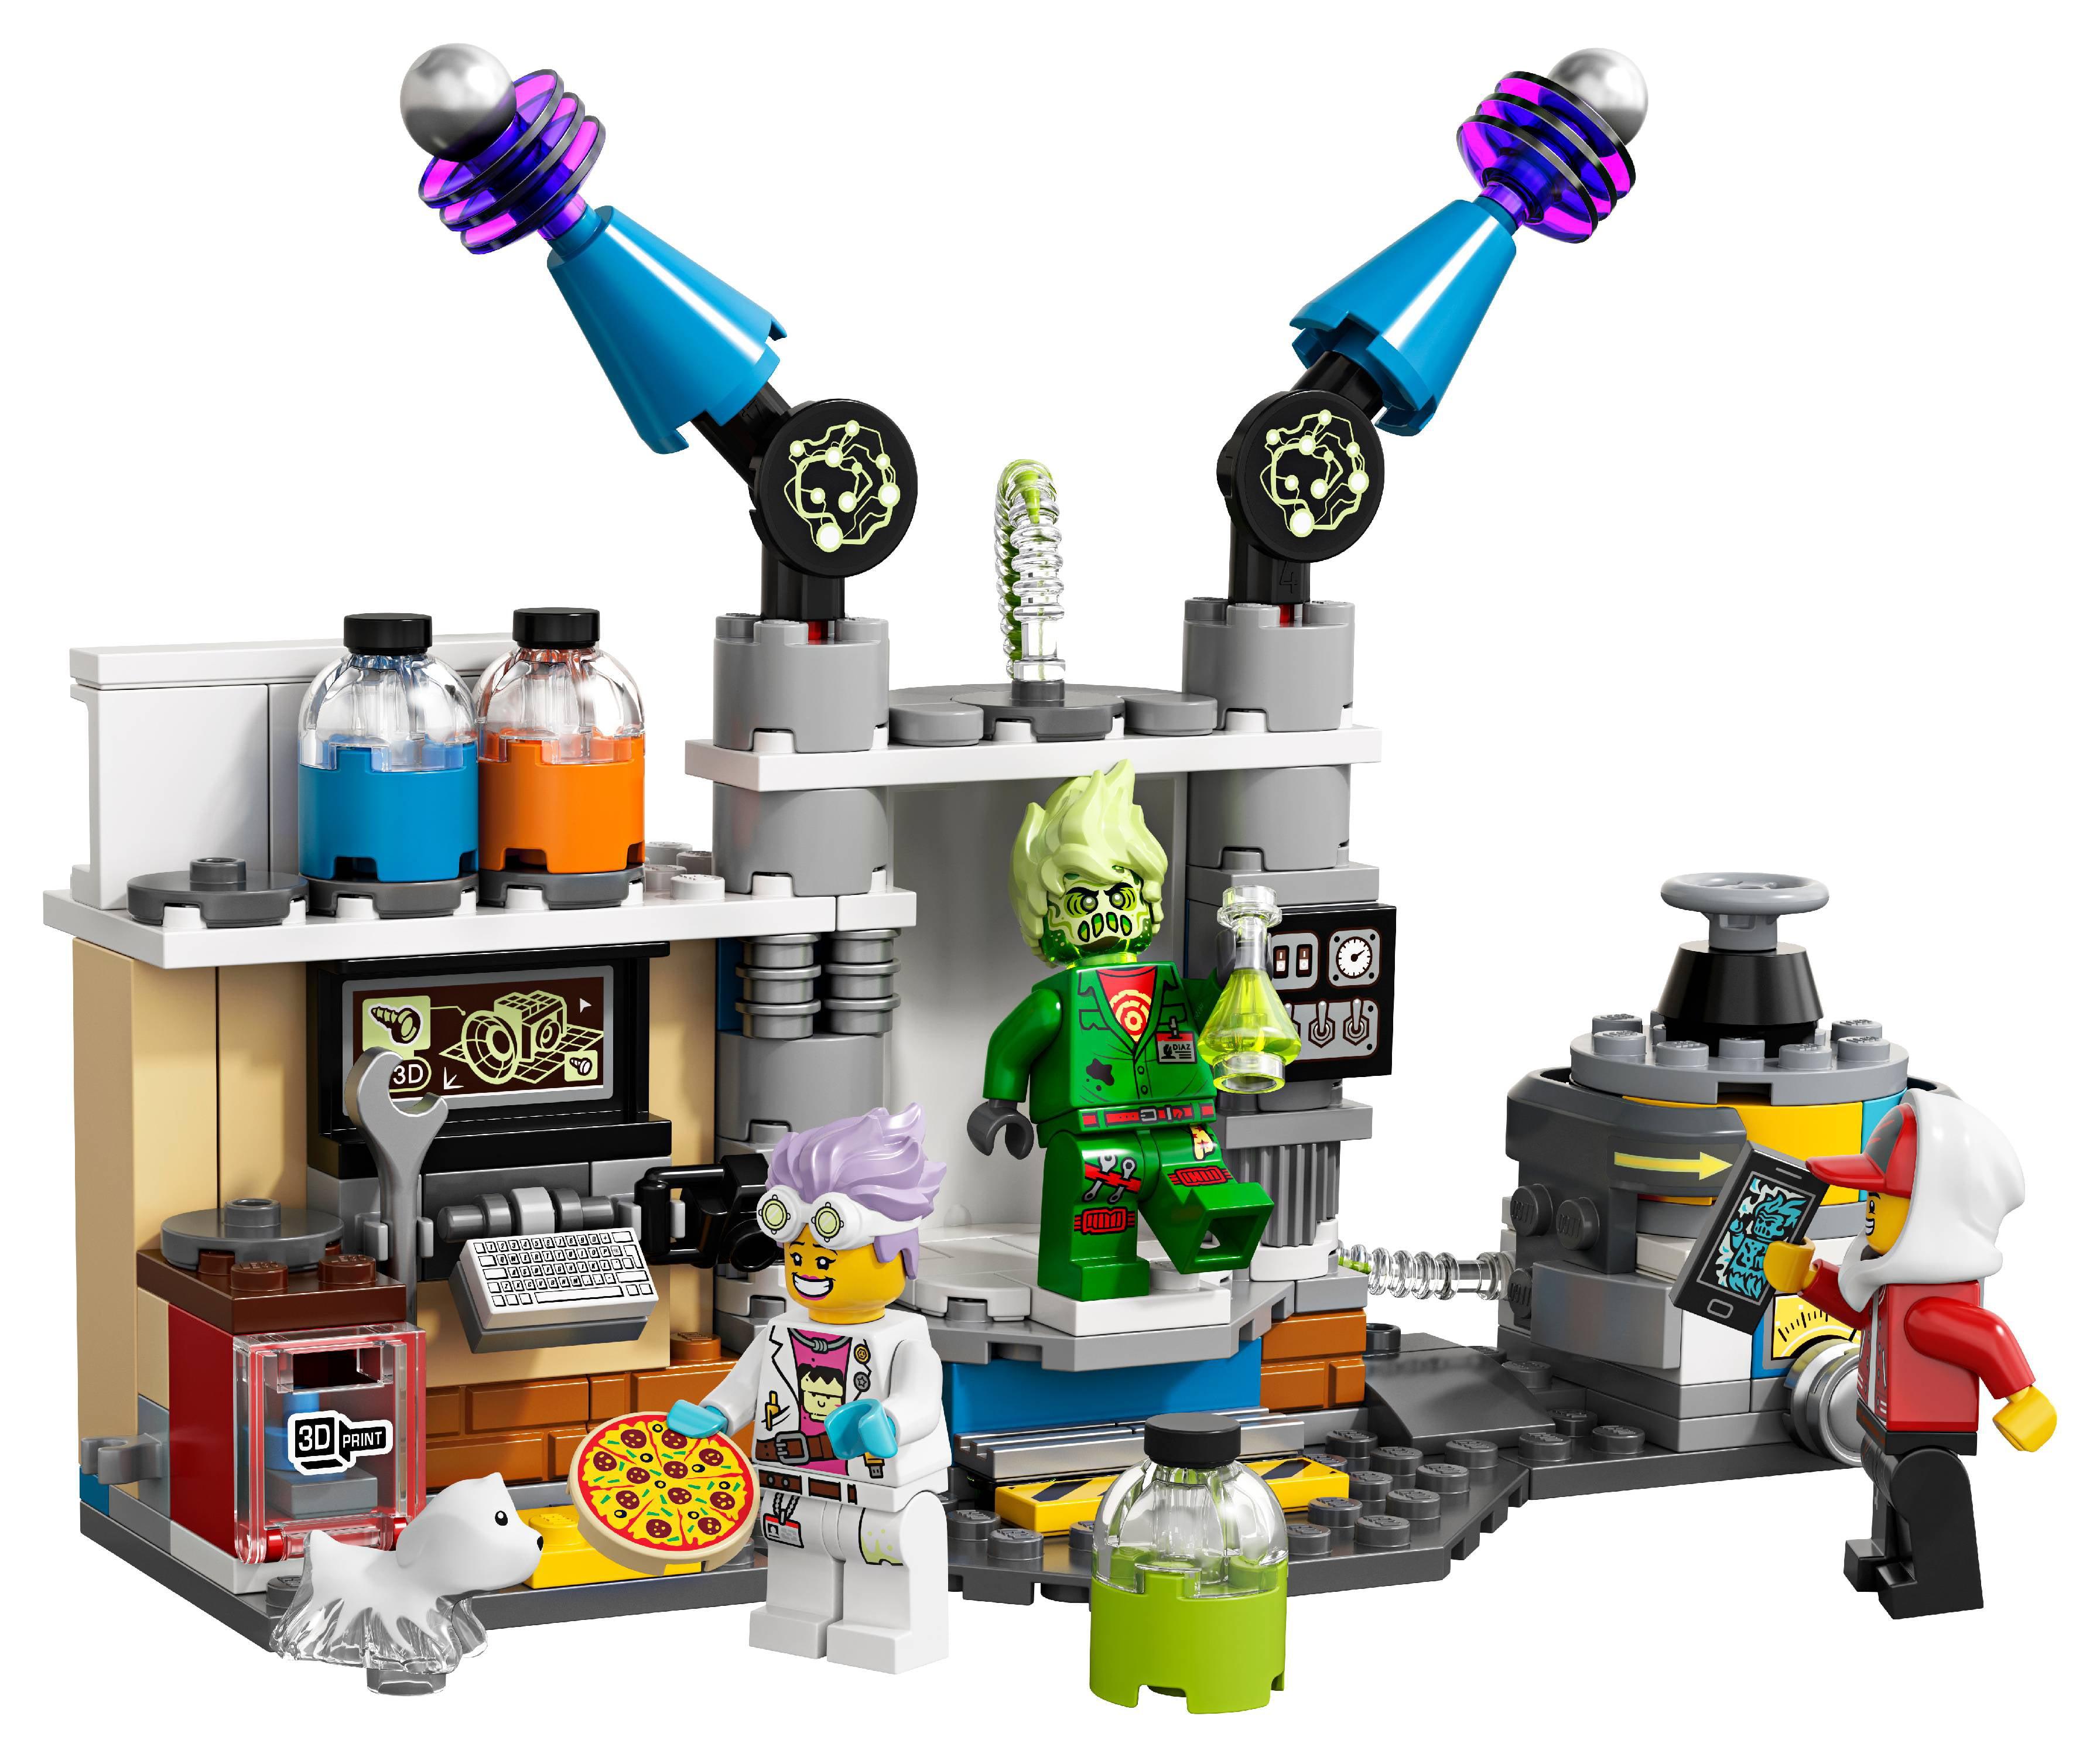 Lego Hidden Side Augmented Reality Ar J B S Ghost Lab 70418 174 Pieces Walmart Com Walmart Com